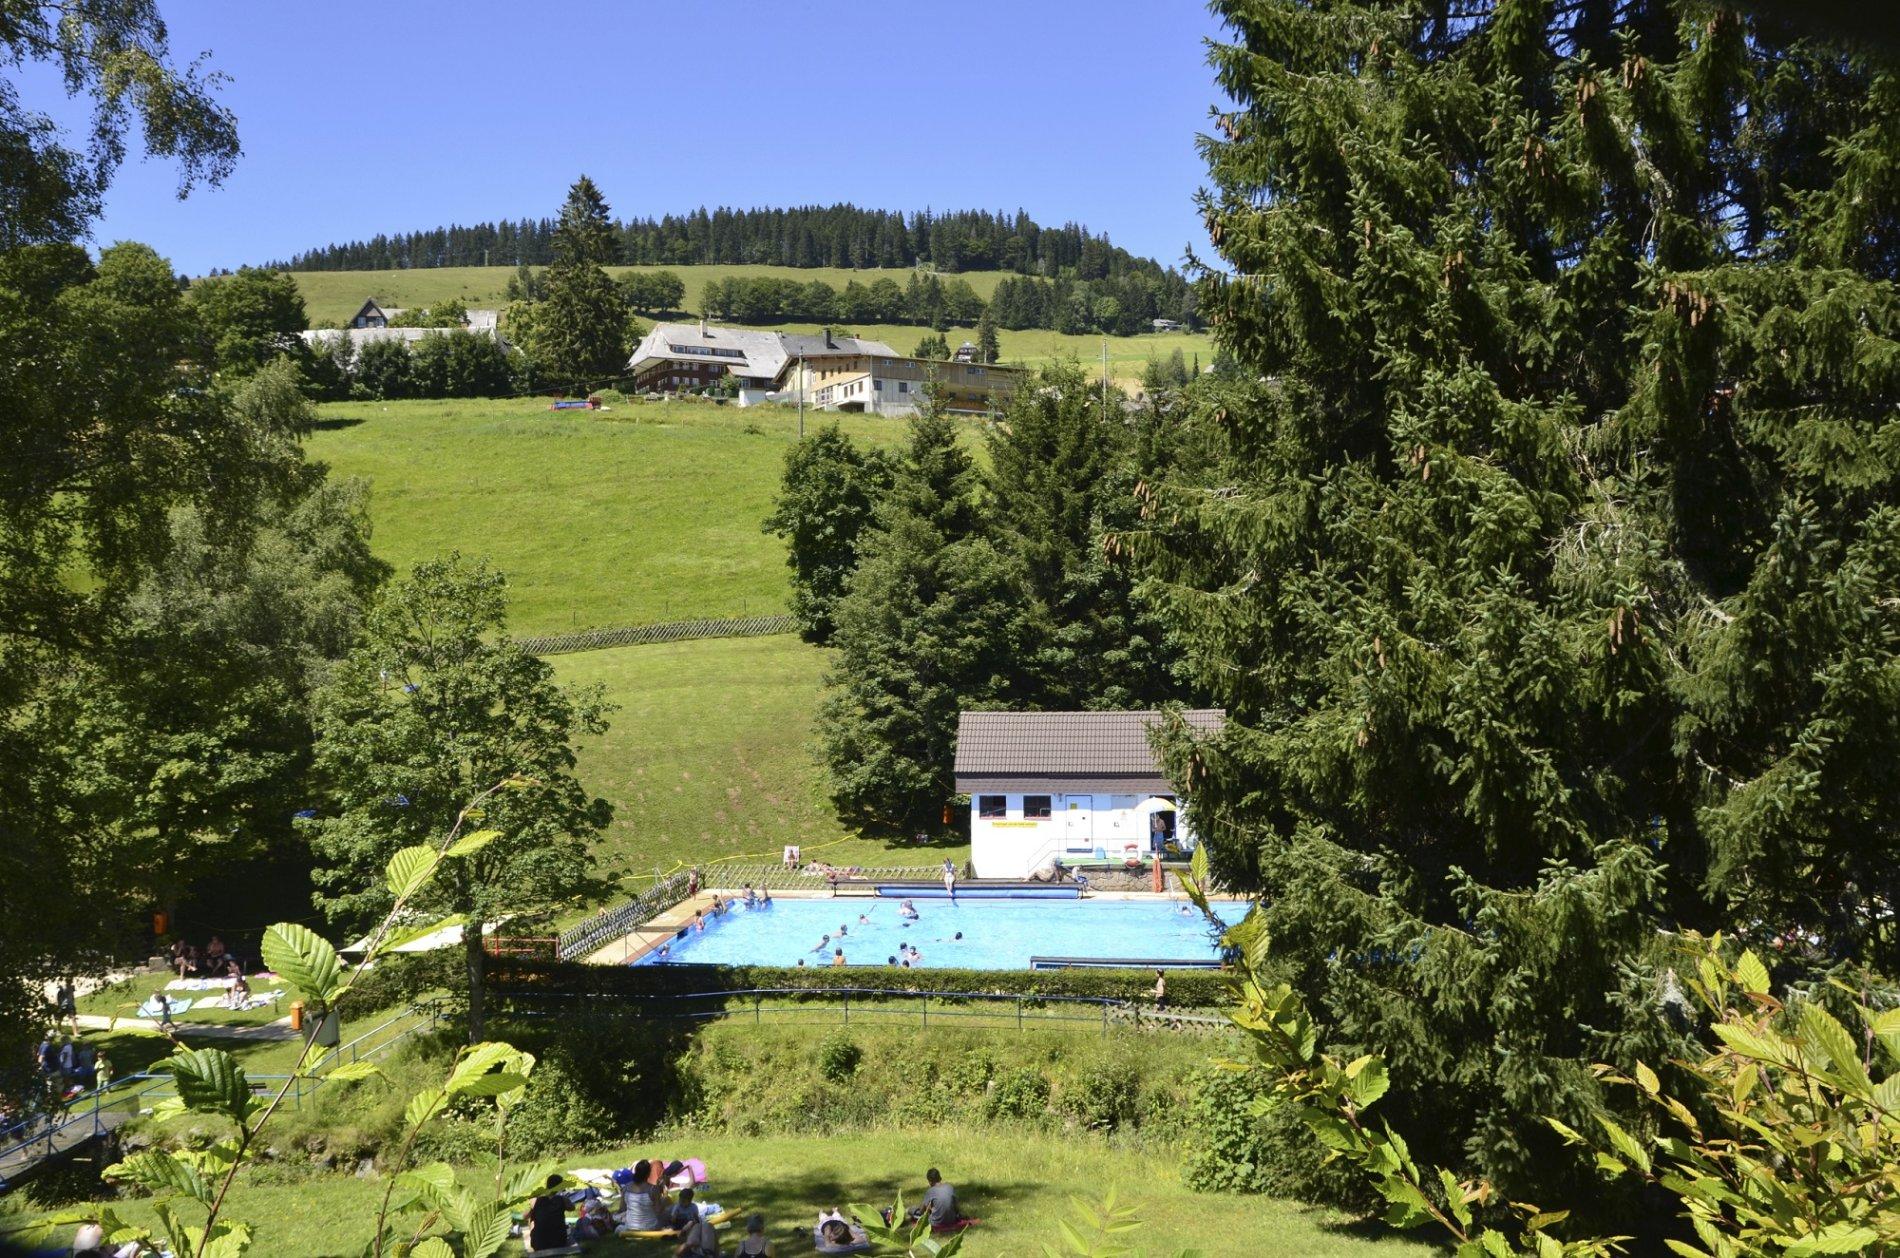 Schwimmbad in Todtnauberg